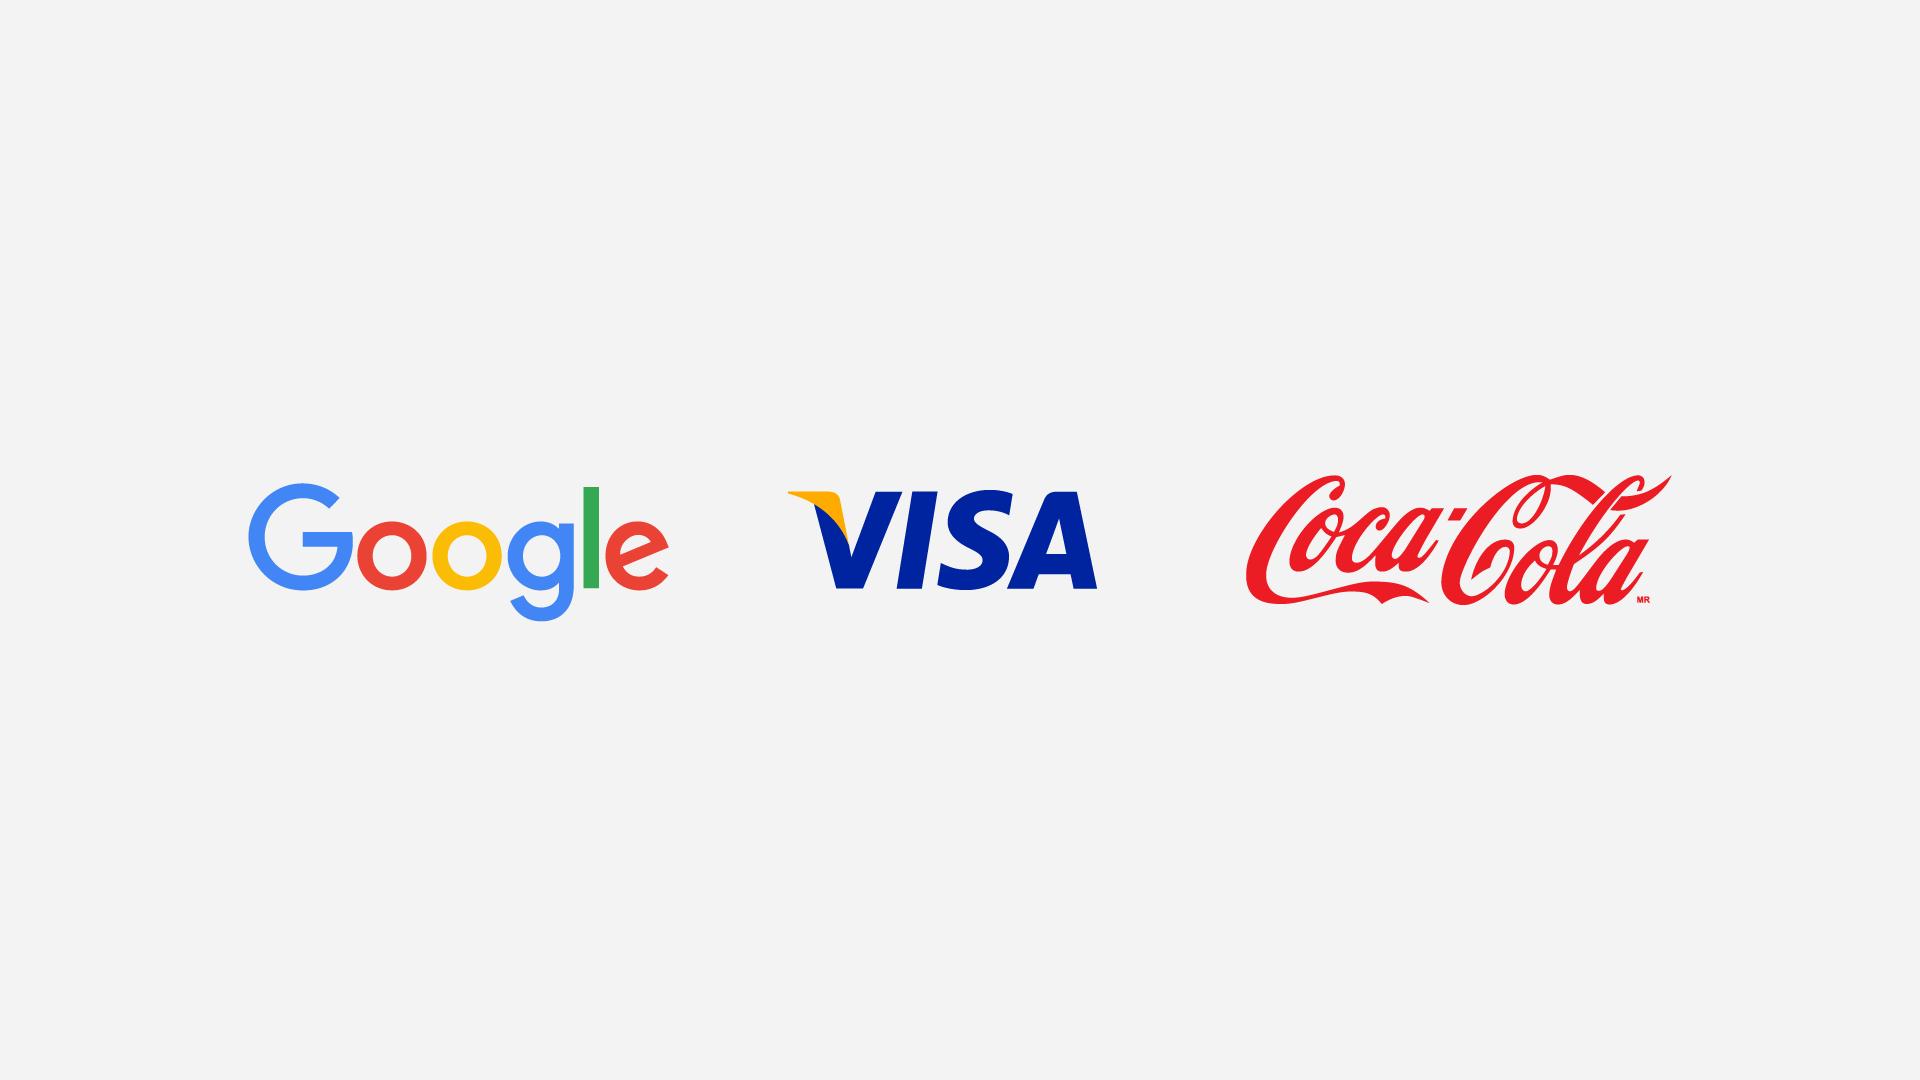 Wordmark Logos for Google, Visa and Coca-Cola